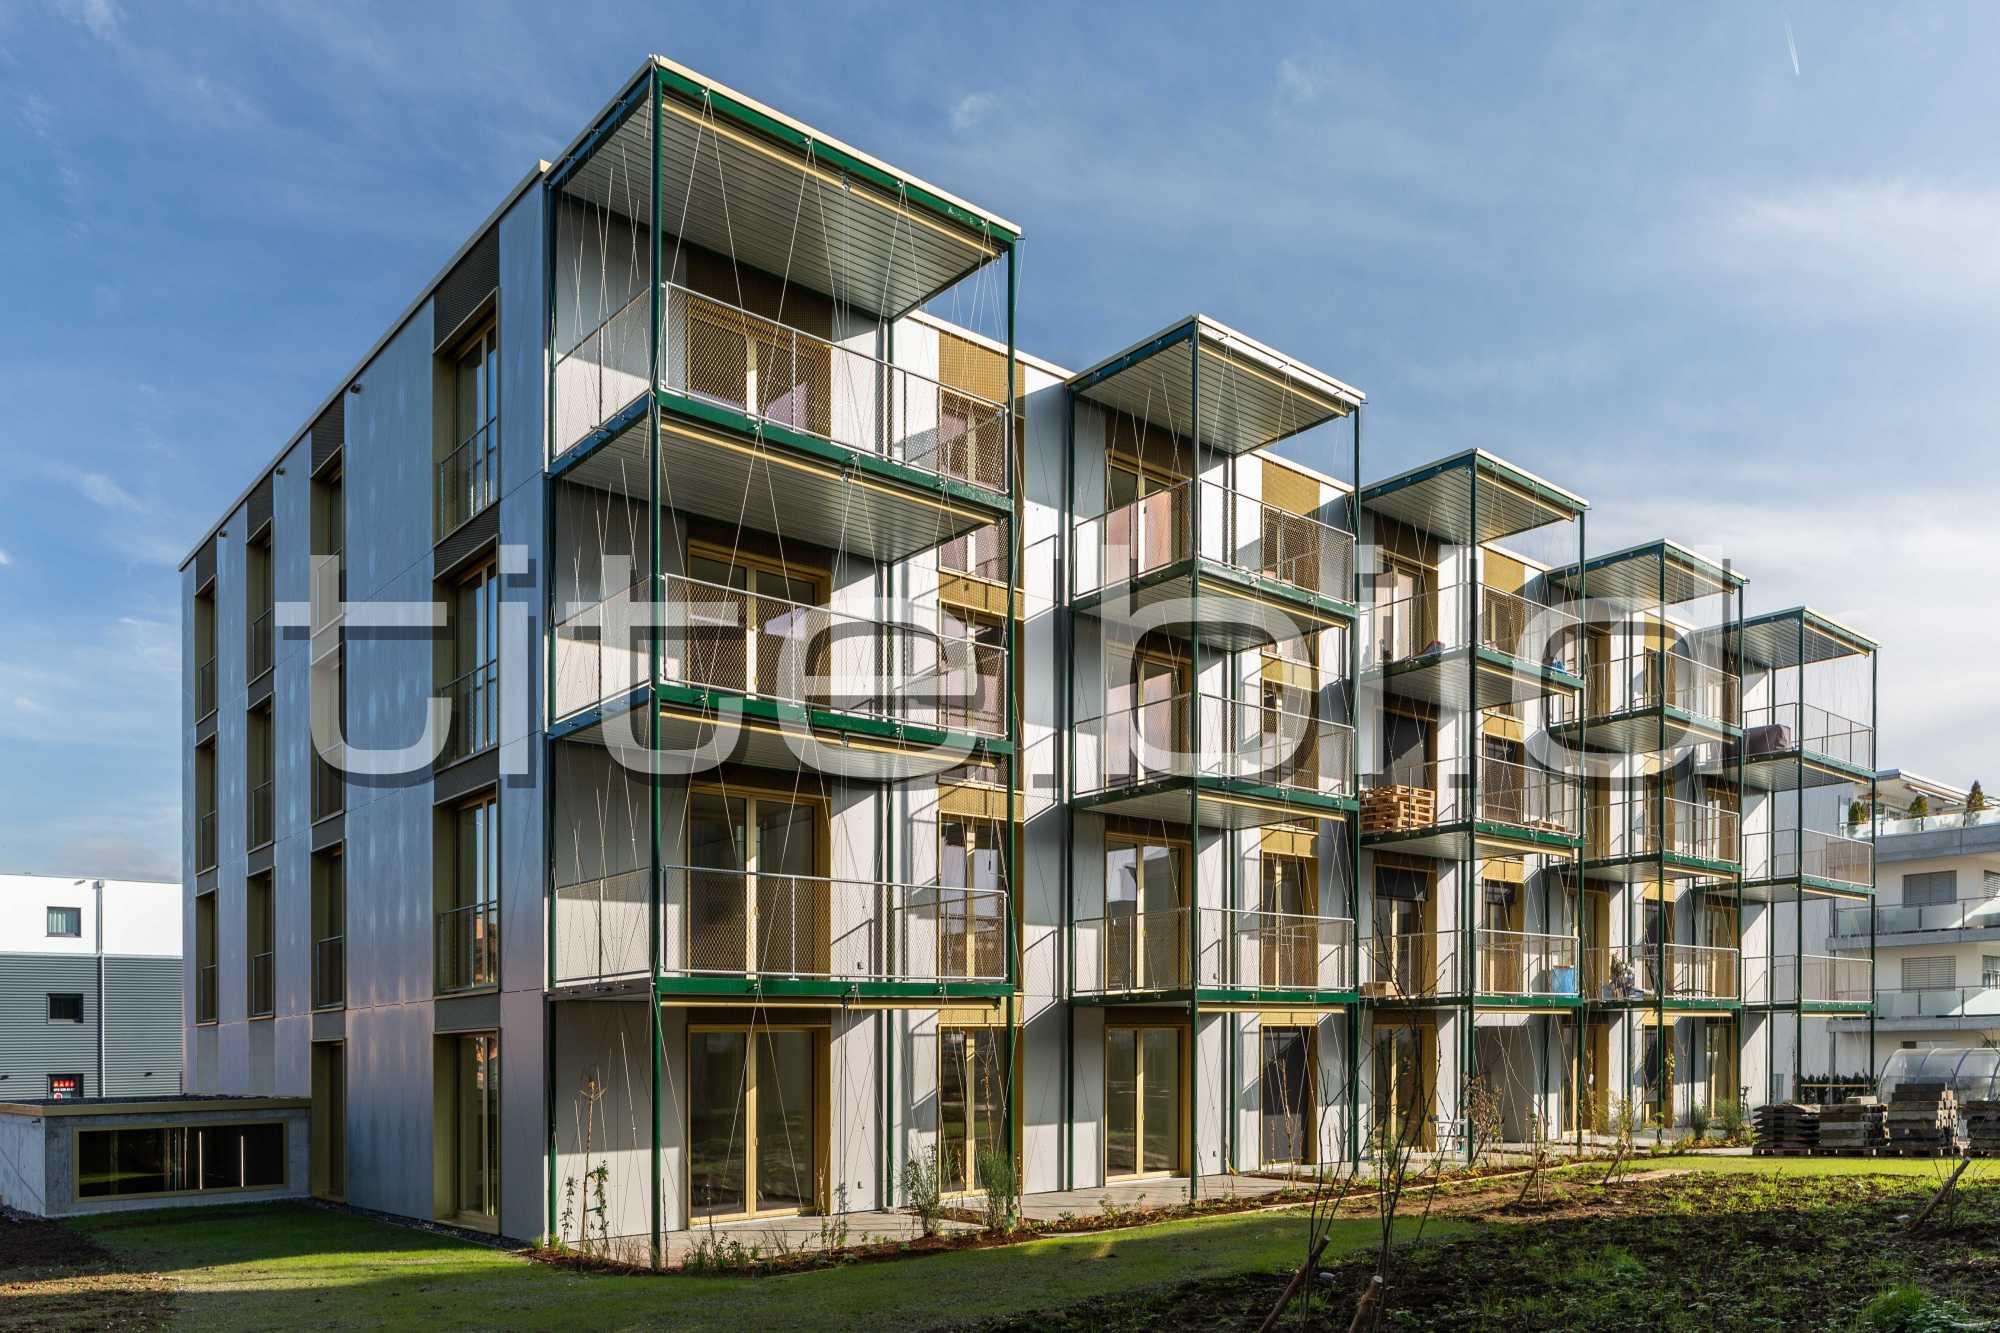 Projektbild-Nr. 0: Quattro Sorelle, Bülach